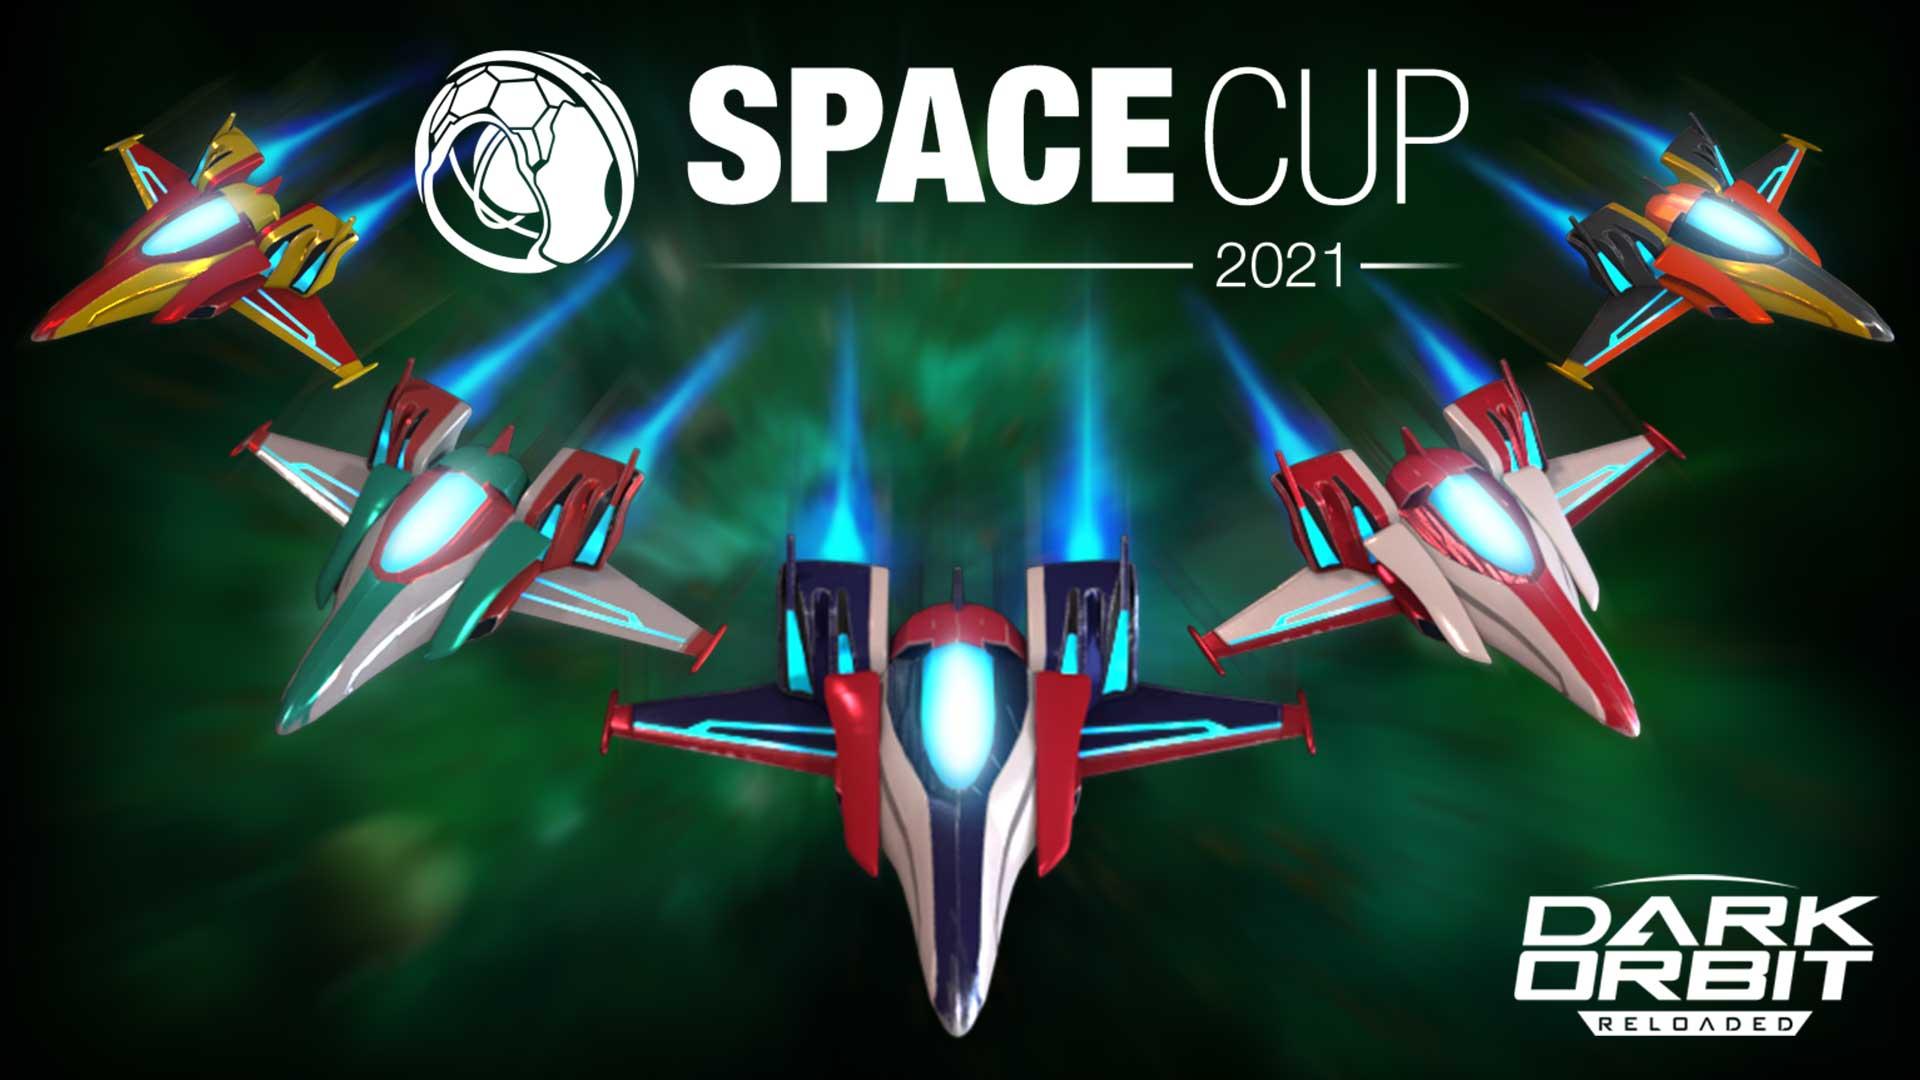 DO_marketing_spacecup202106[50].jpg